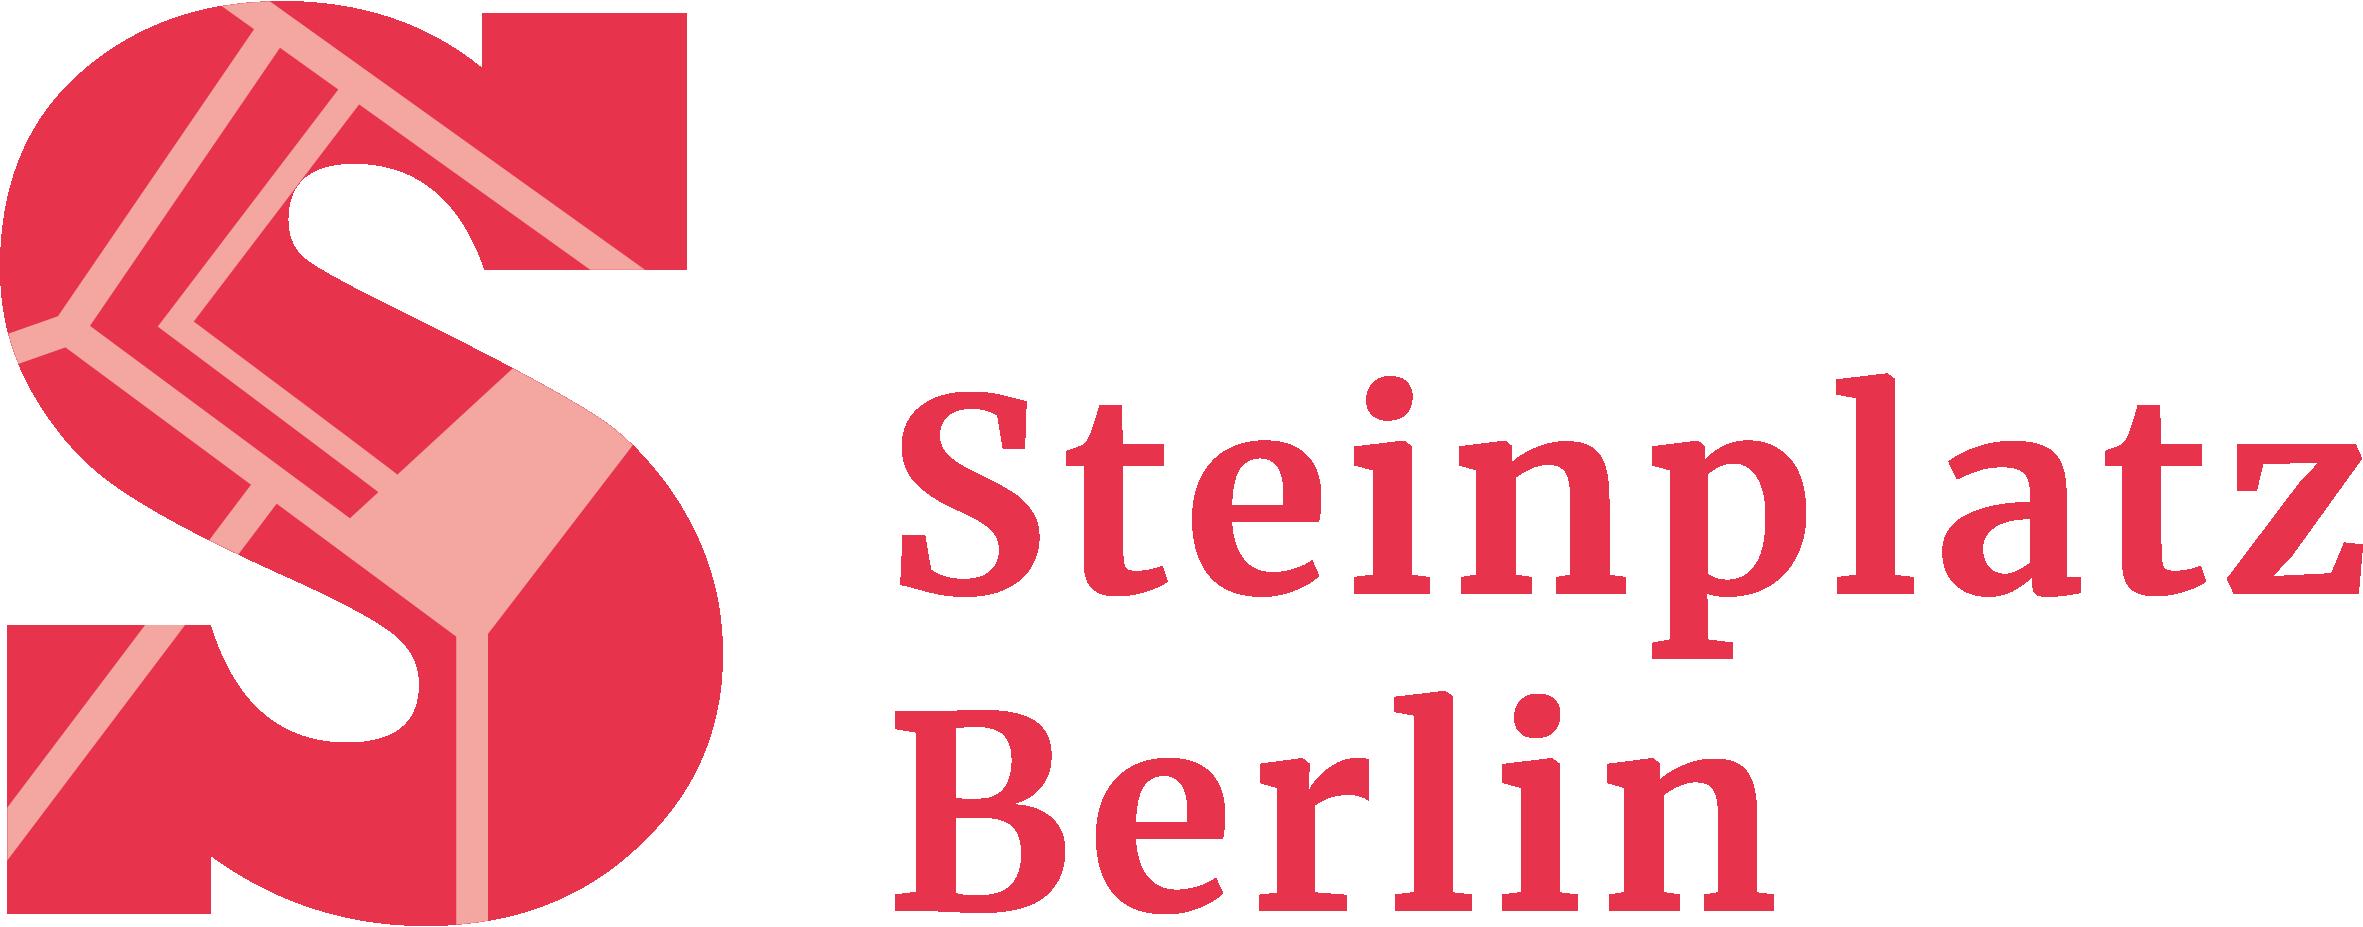 Steinplatz Berlin